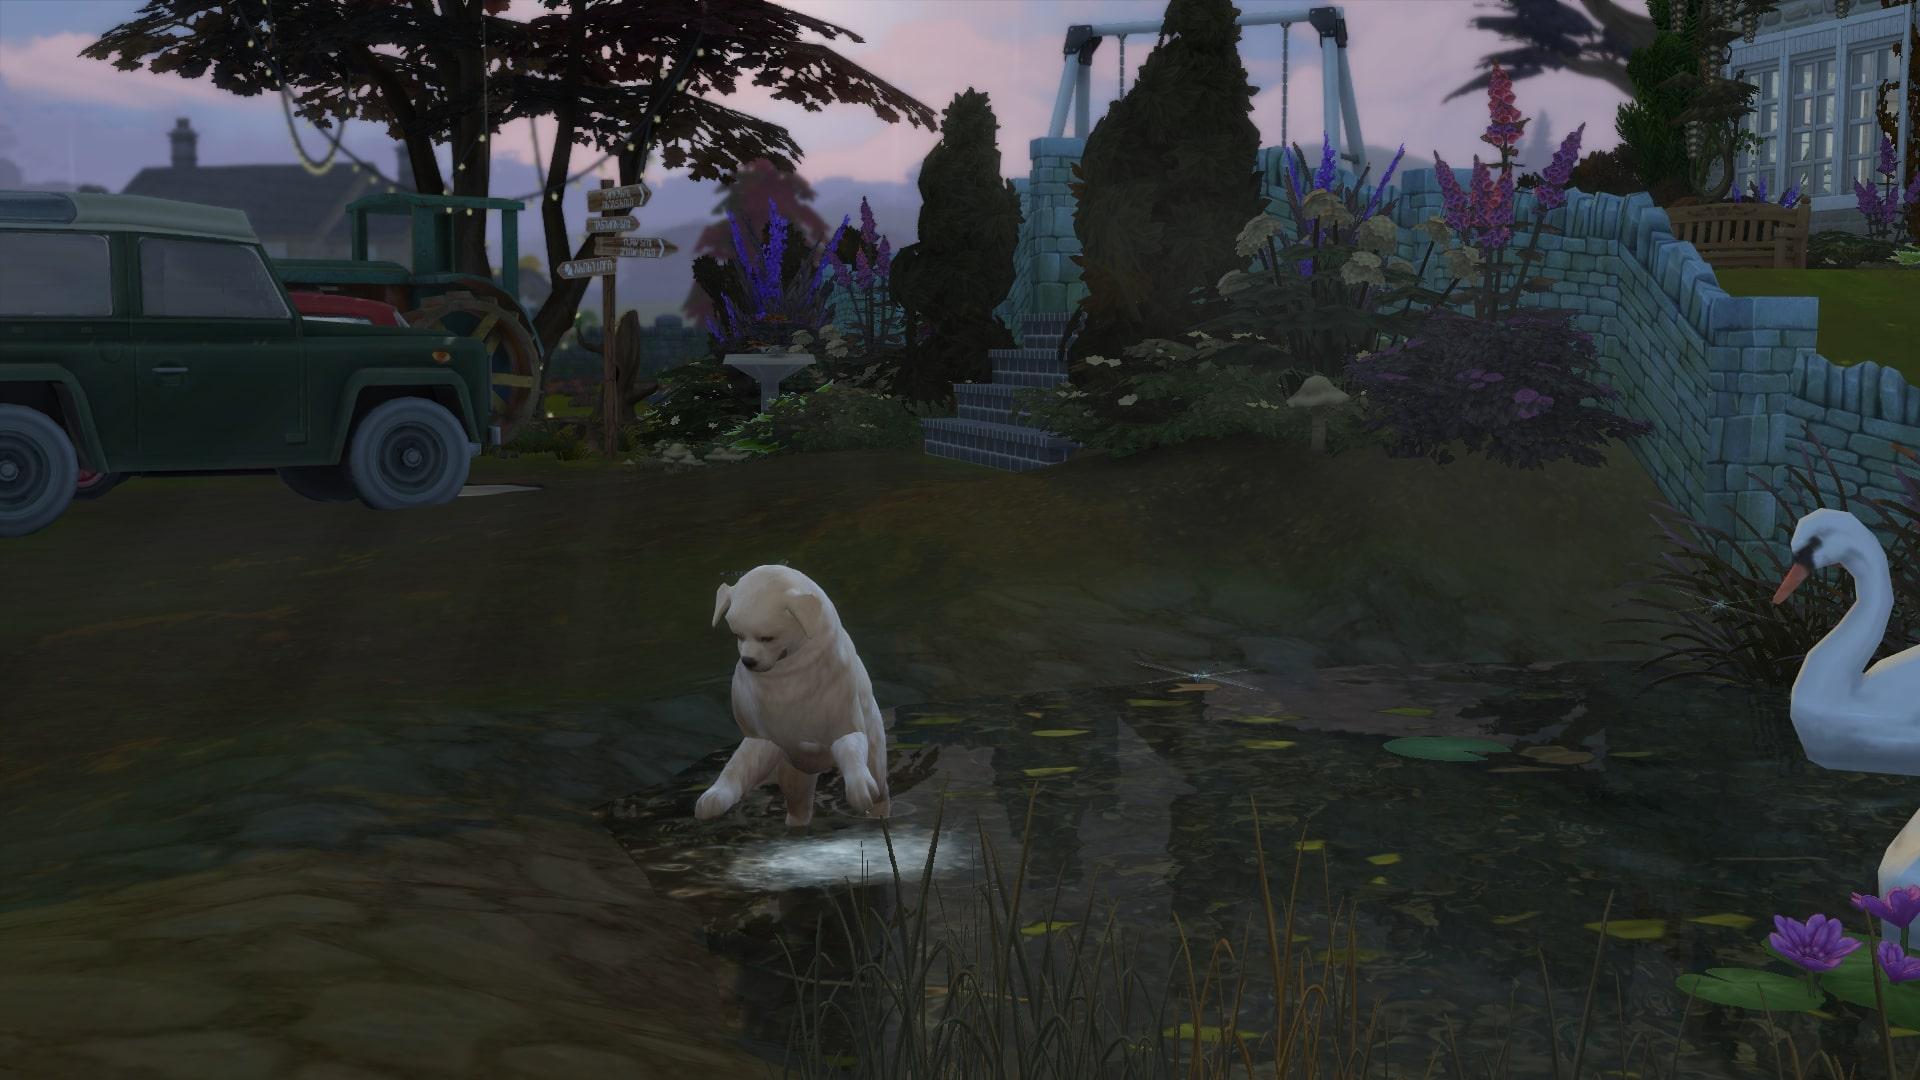 The Sims 4: Idyllic countryside